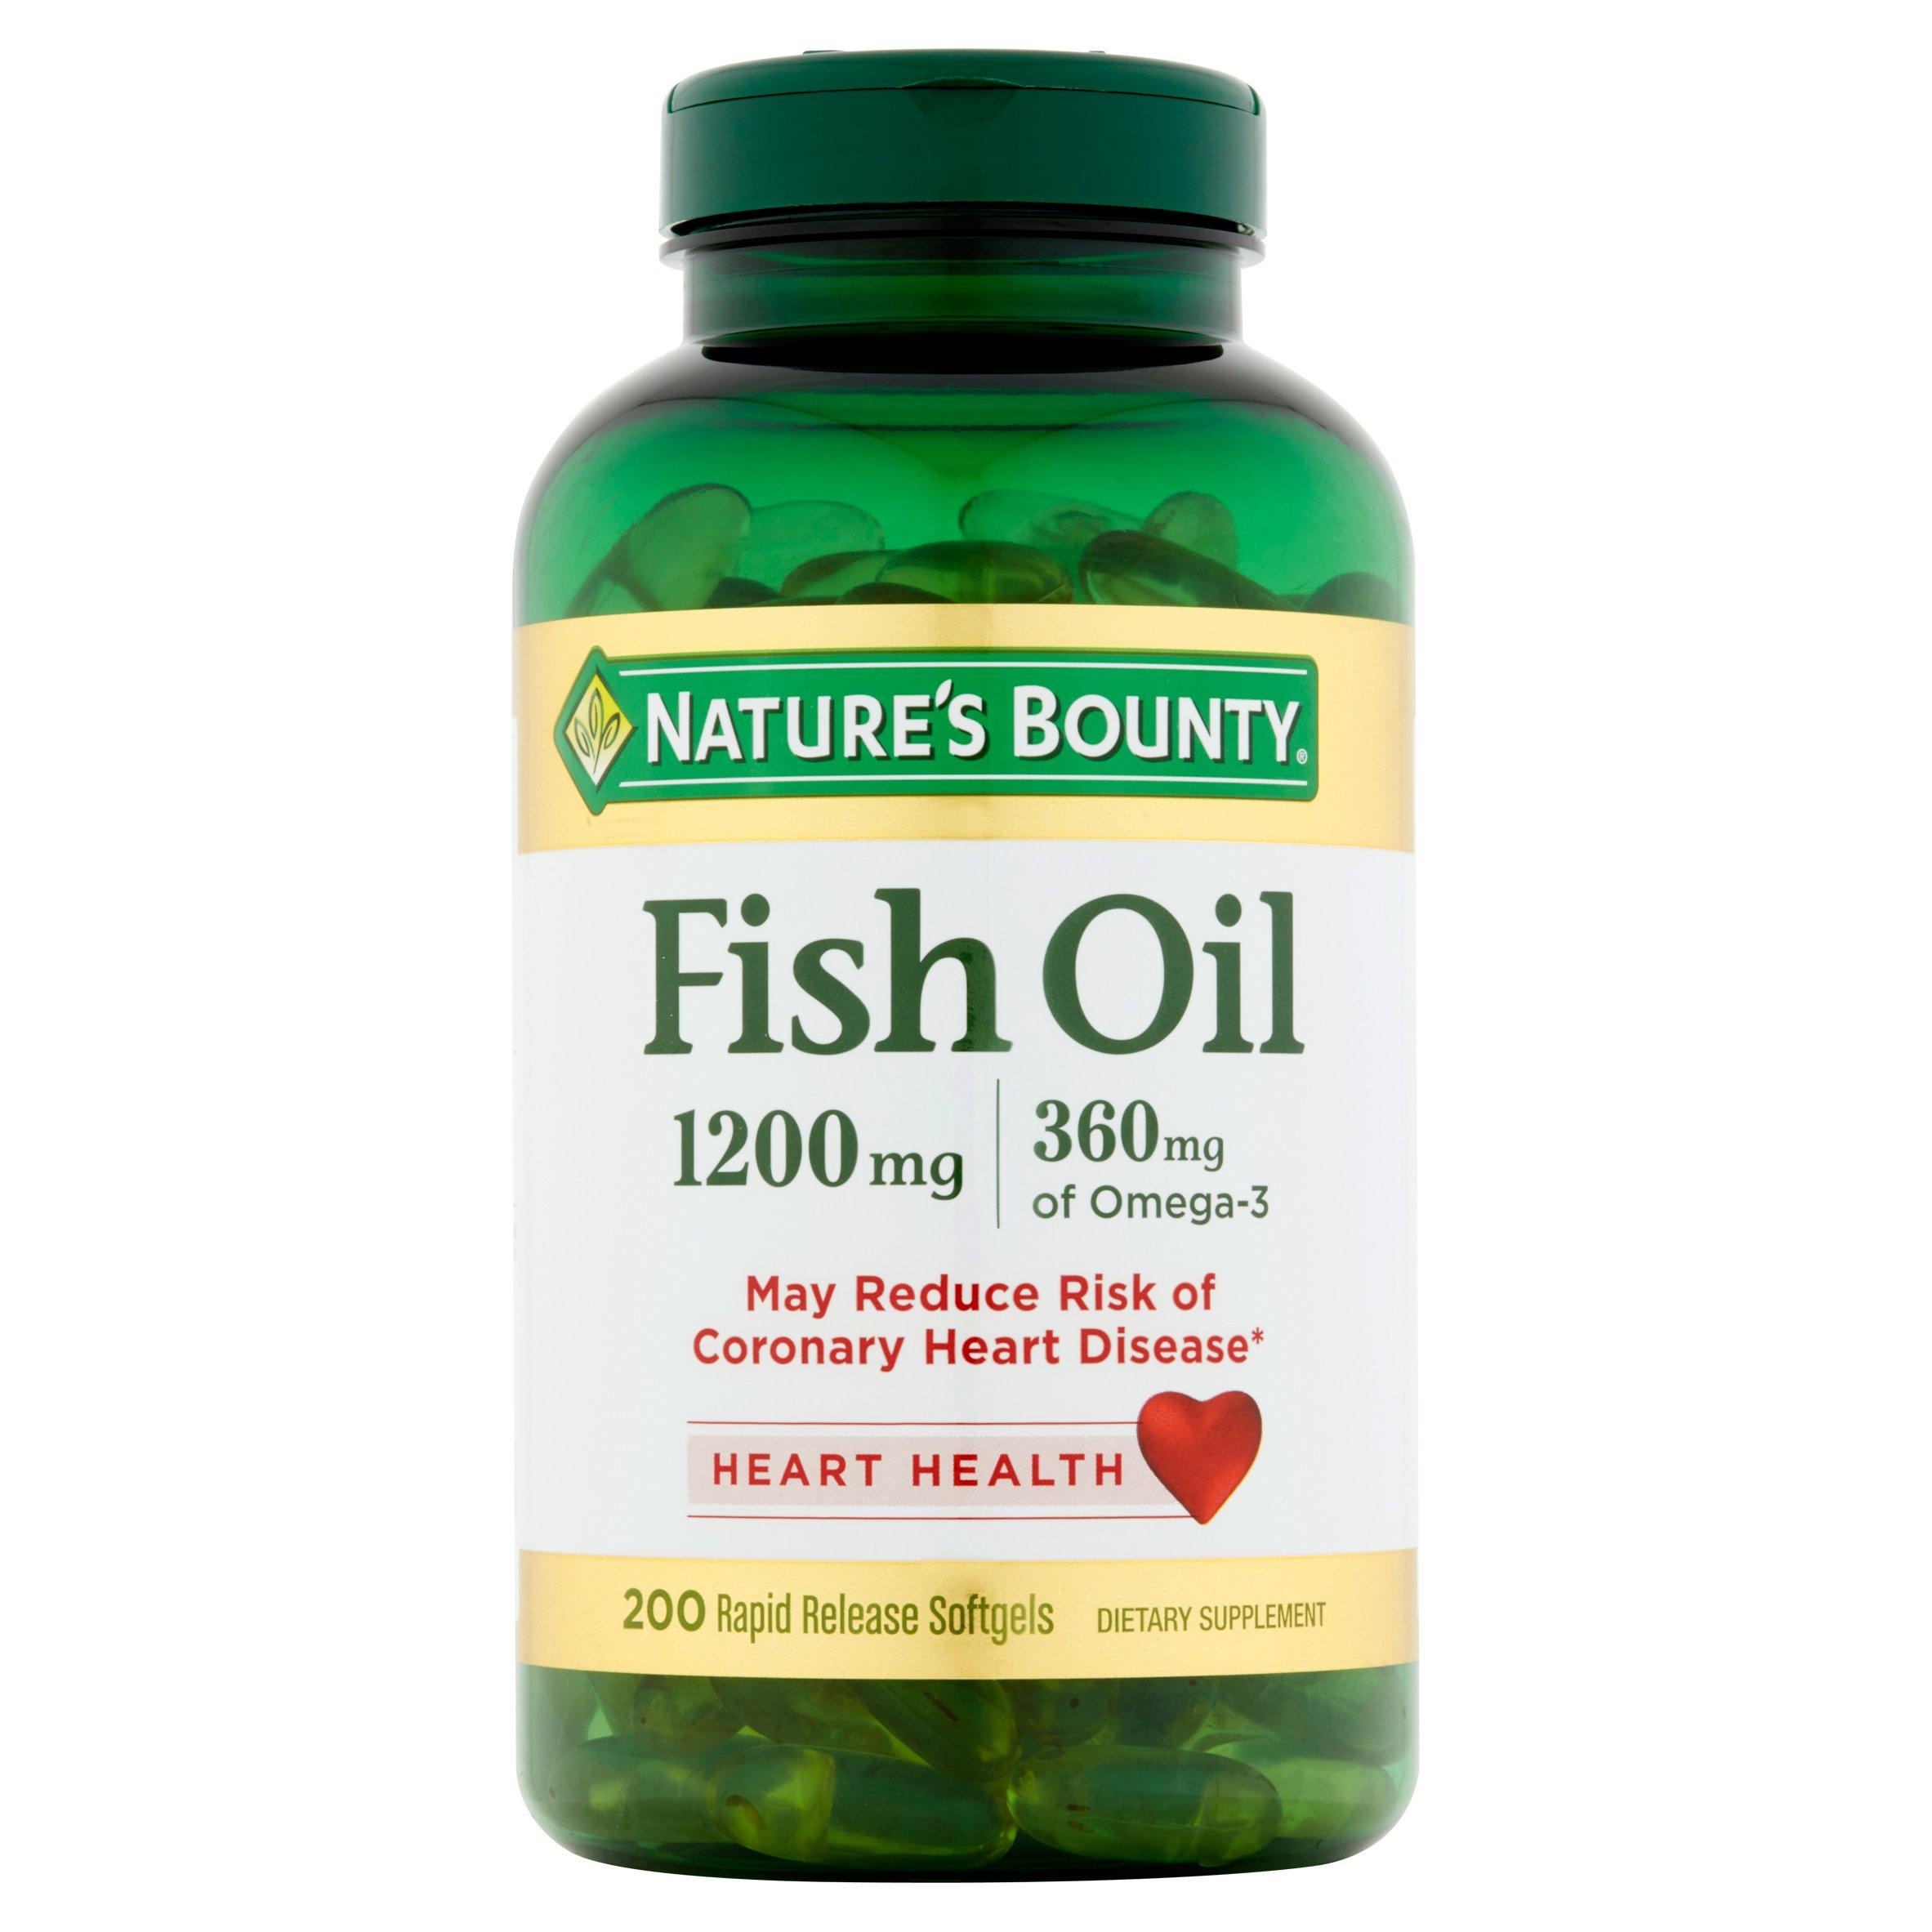 Nature's Bounty Fish Oil Omega-3 Softgels, 1200 Mg, 200 Ct